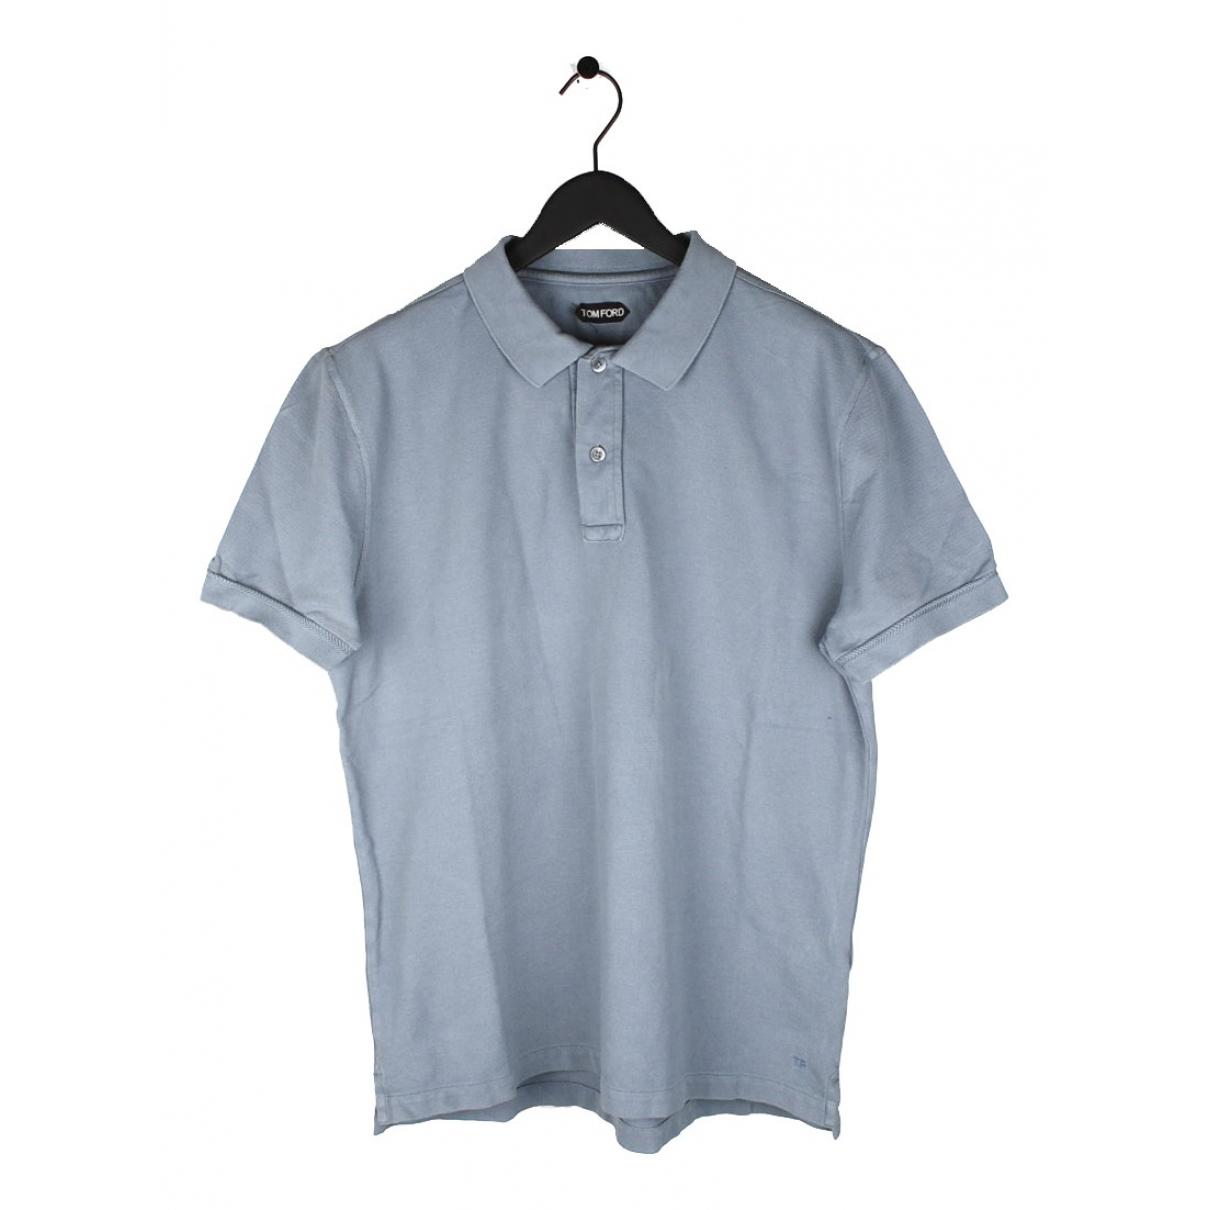 Tom Ford N Cotton Polo shirts for Men XL International